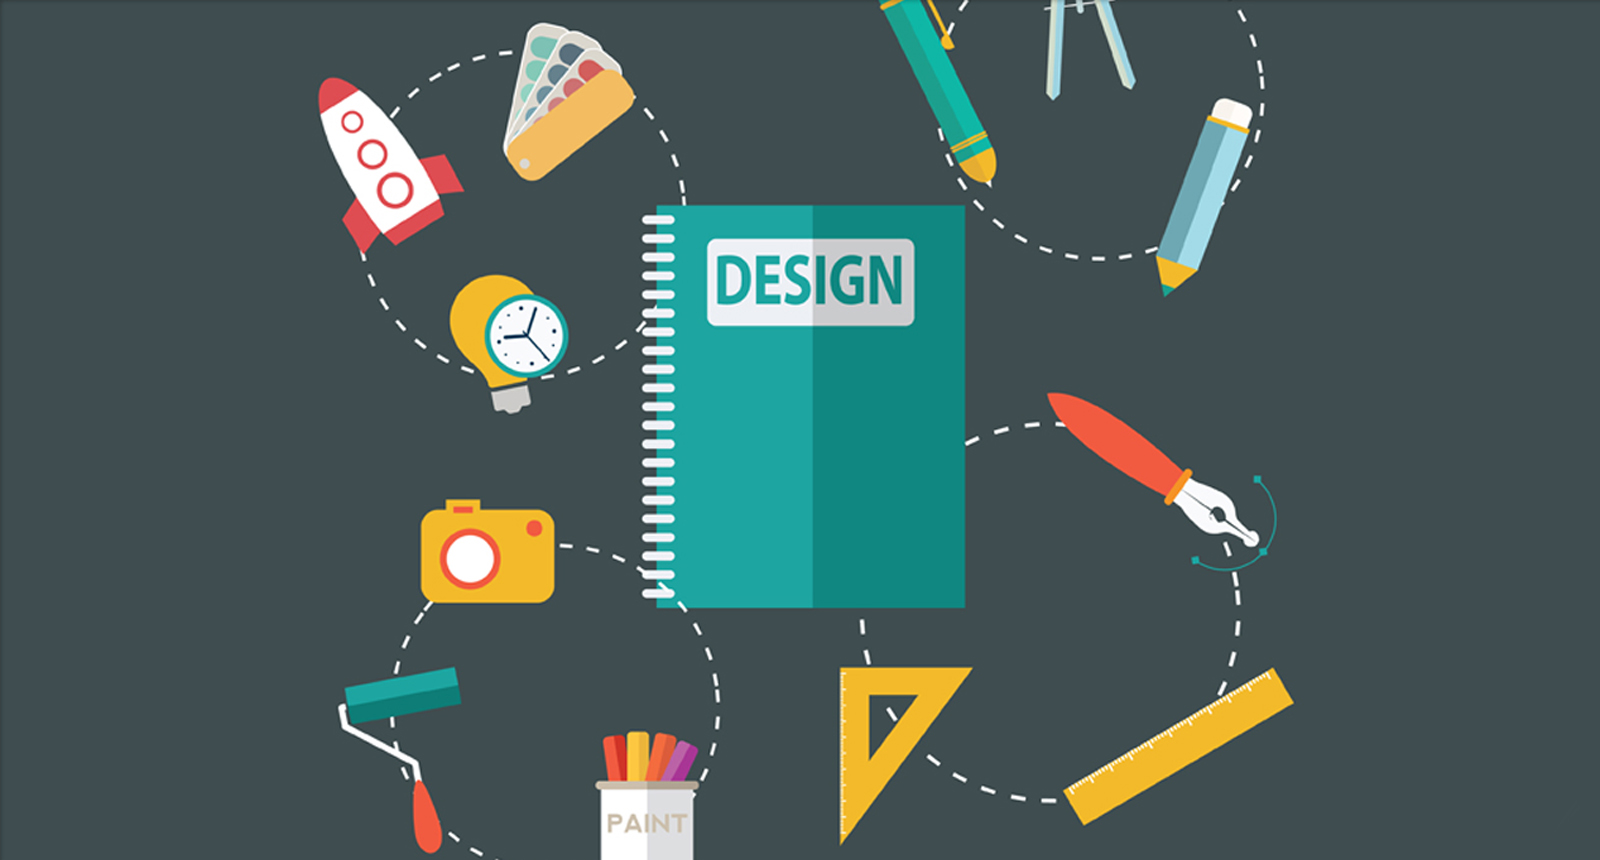 Коммуникативный дизайн i курс